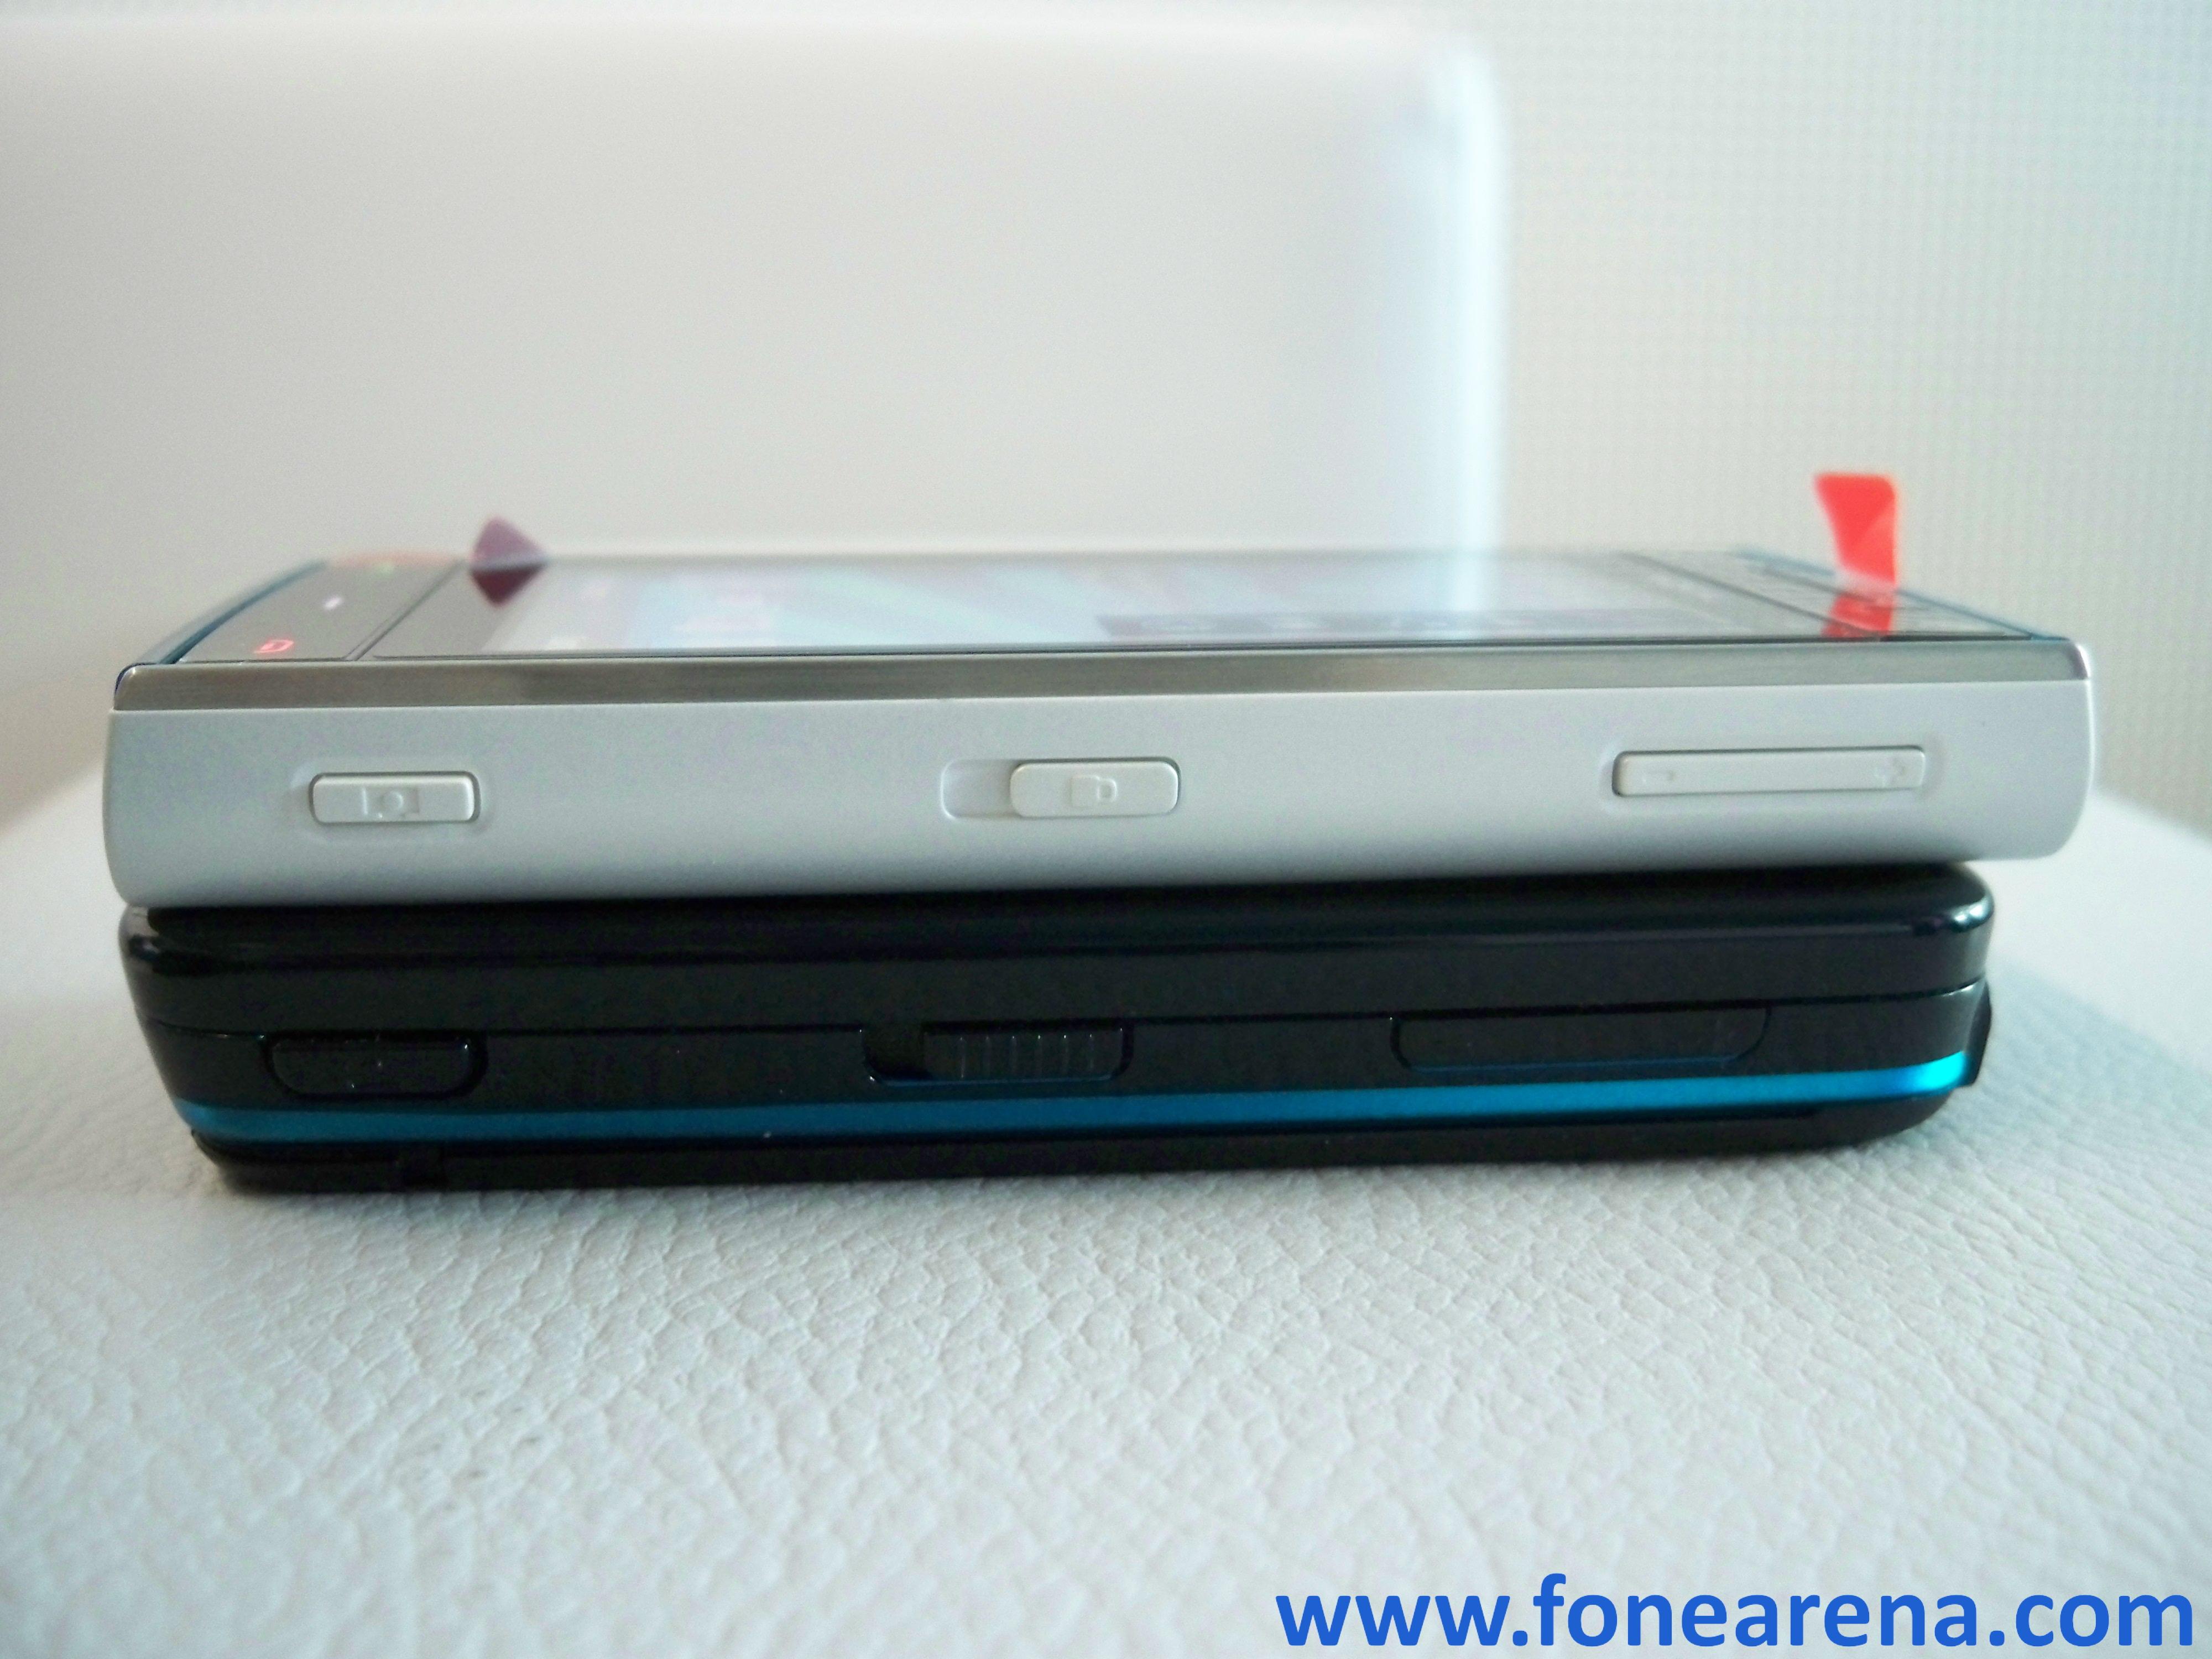 Nokia X6 Photo Gallery: 5800XM Comparison & BH-505 Mixing